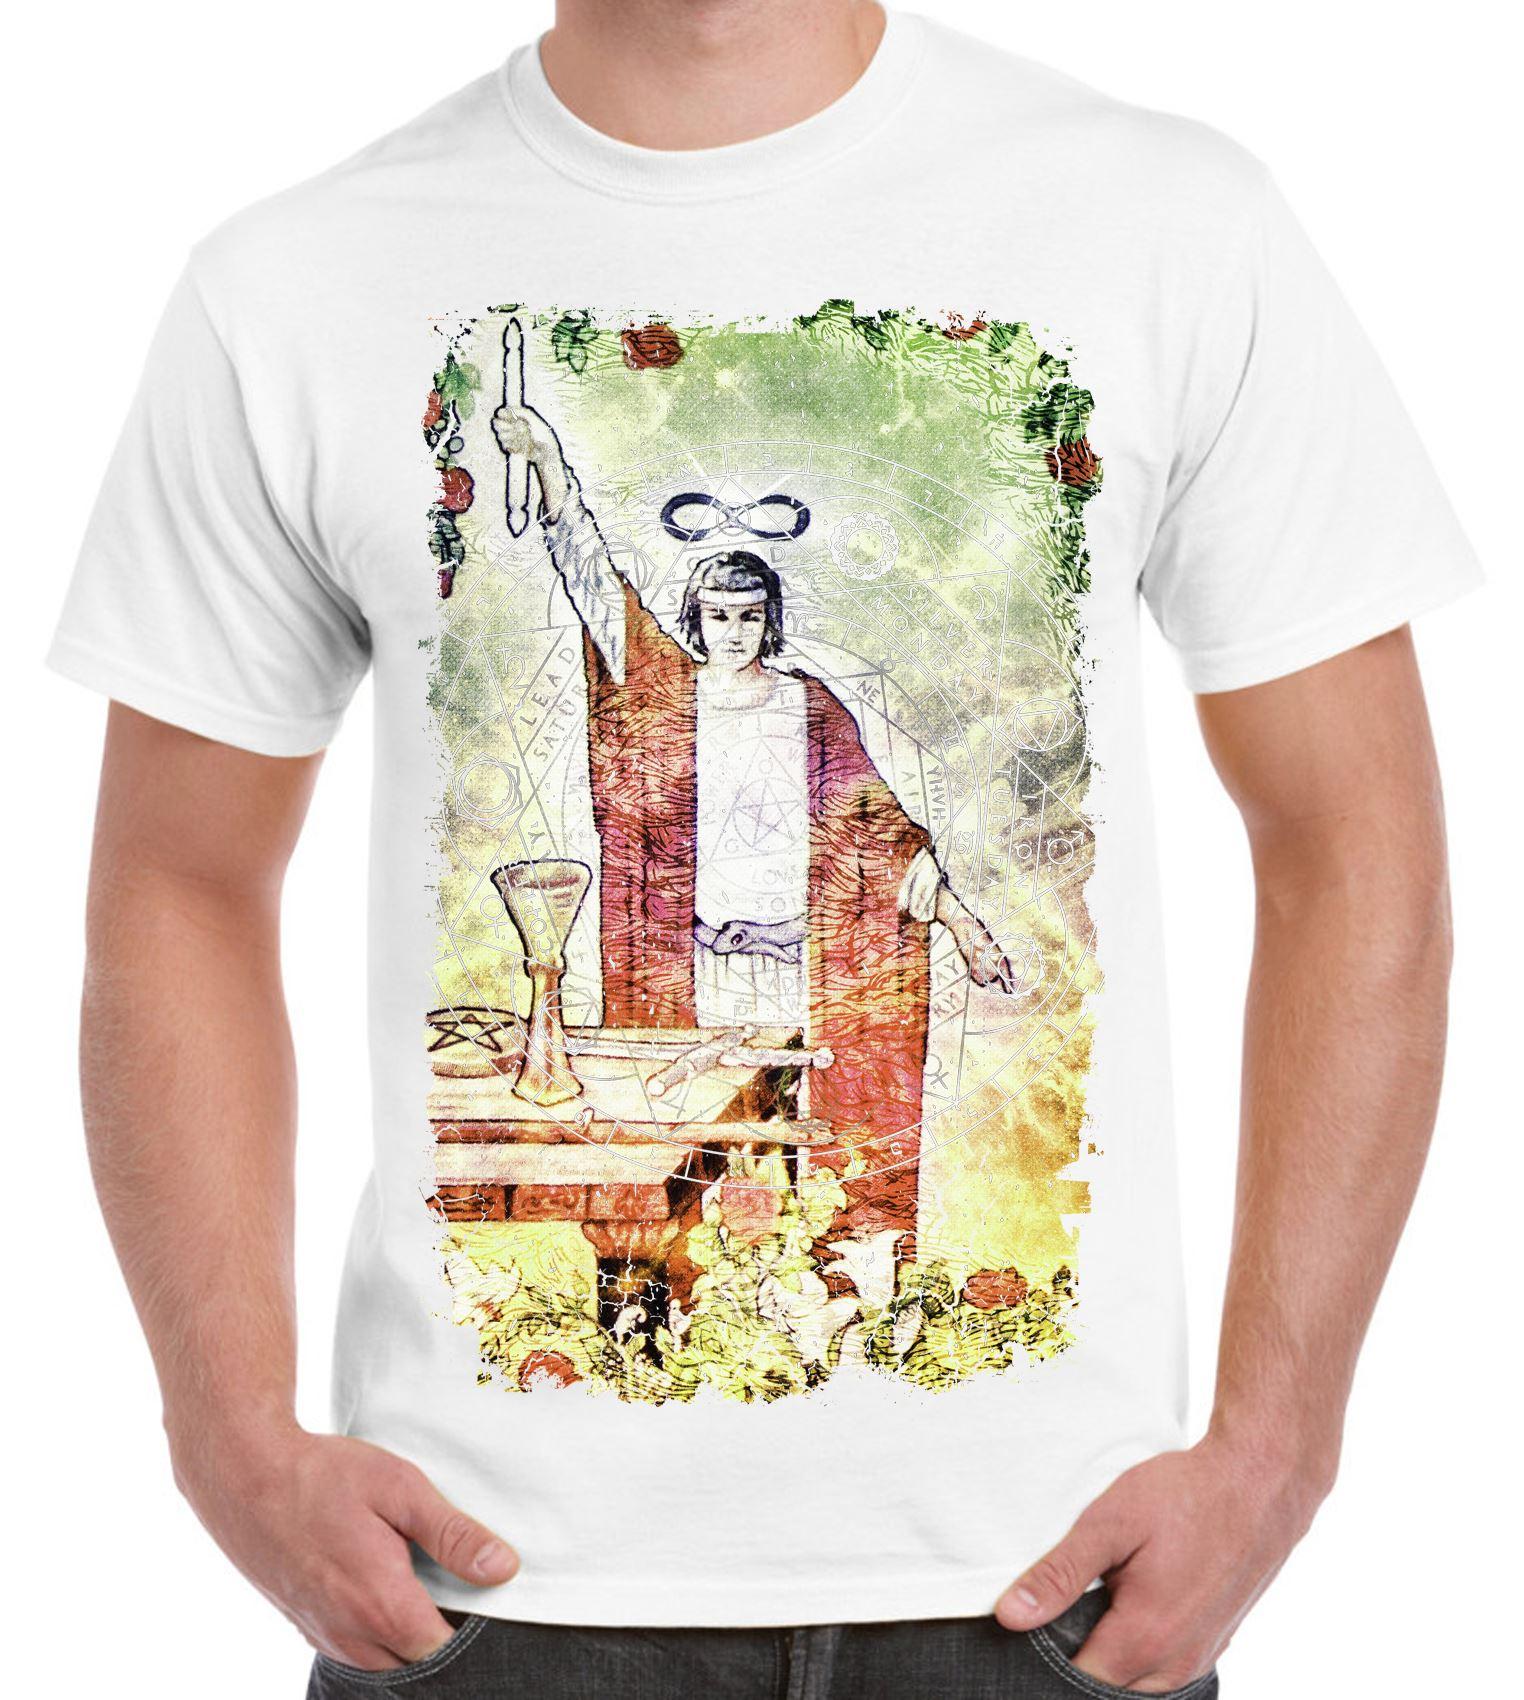 bd1f4ecd90559f The Magician Tarot Card Large Print Men s T-Shirt - Pagan Wicca Crowley